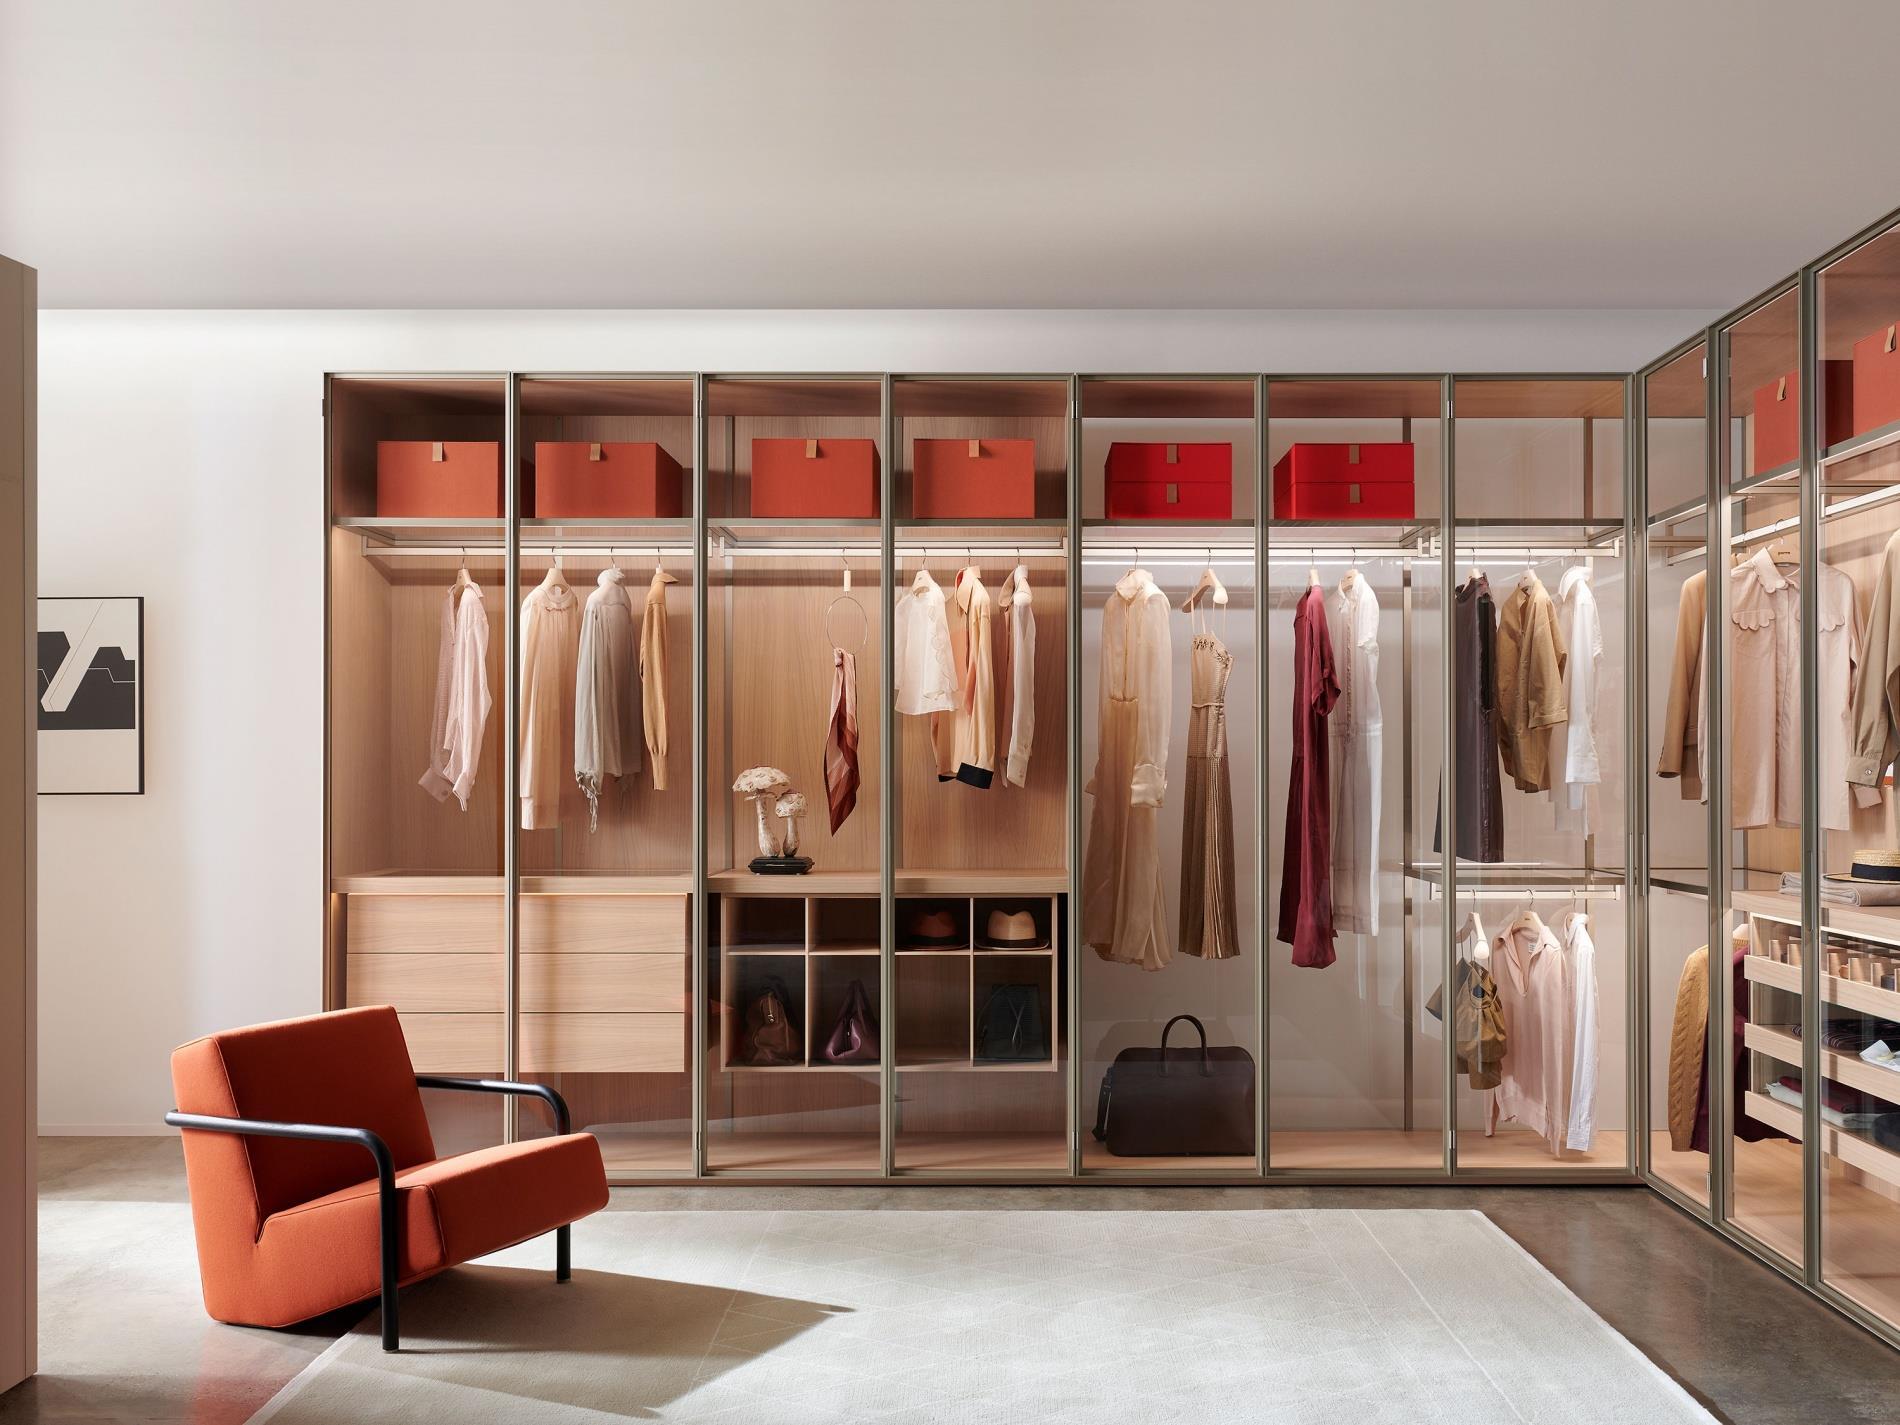 Dream Wardrobe Hanging Space